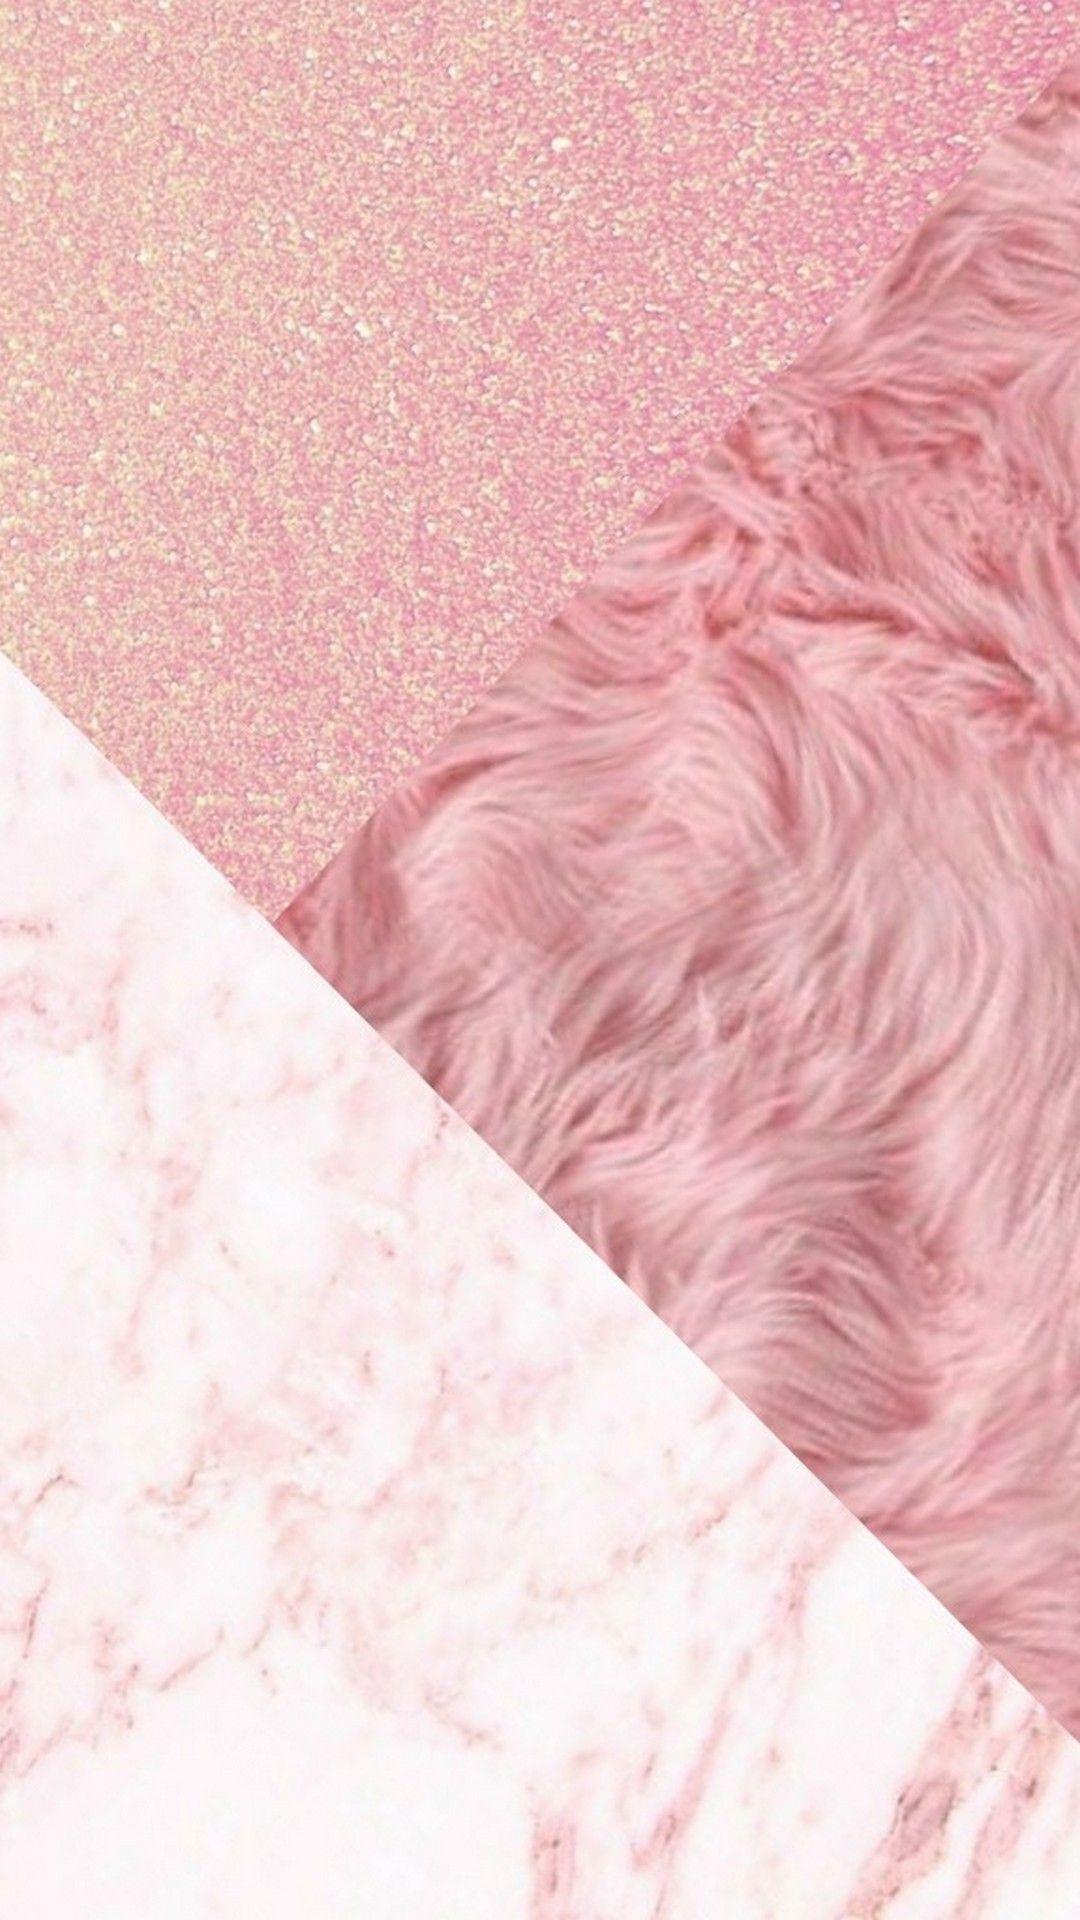 Classy Blush Pink Iphone Wallpaper Hd Wallpaper In 2020 Gold Wallpaper Background Gold Wallpaper Iphone Gold Glitter Wallpaper Iphone